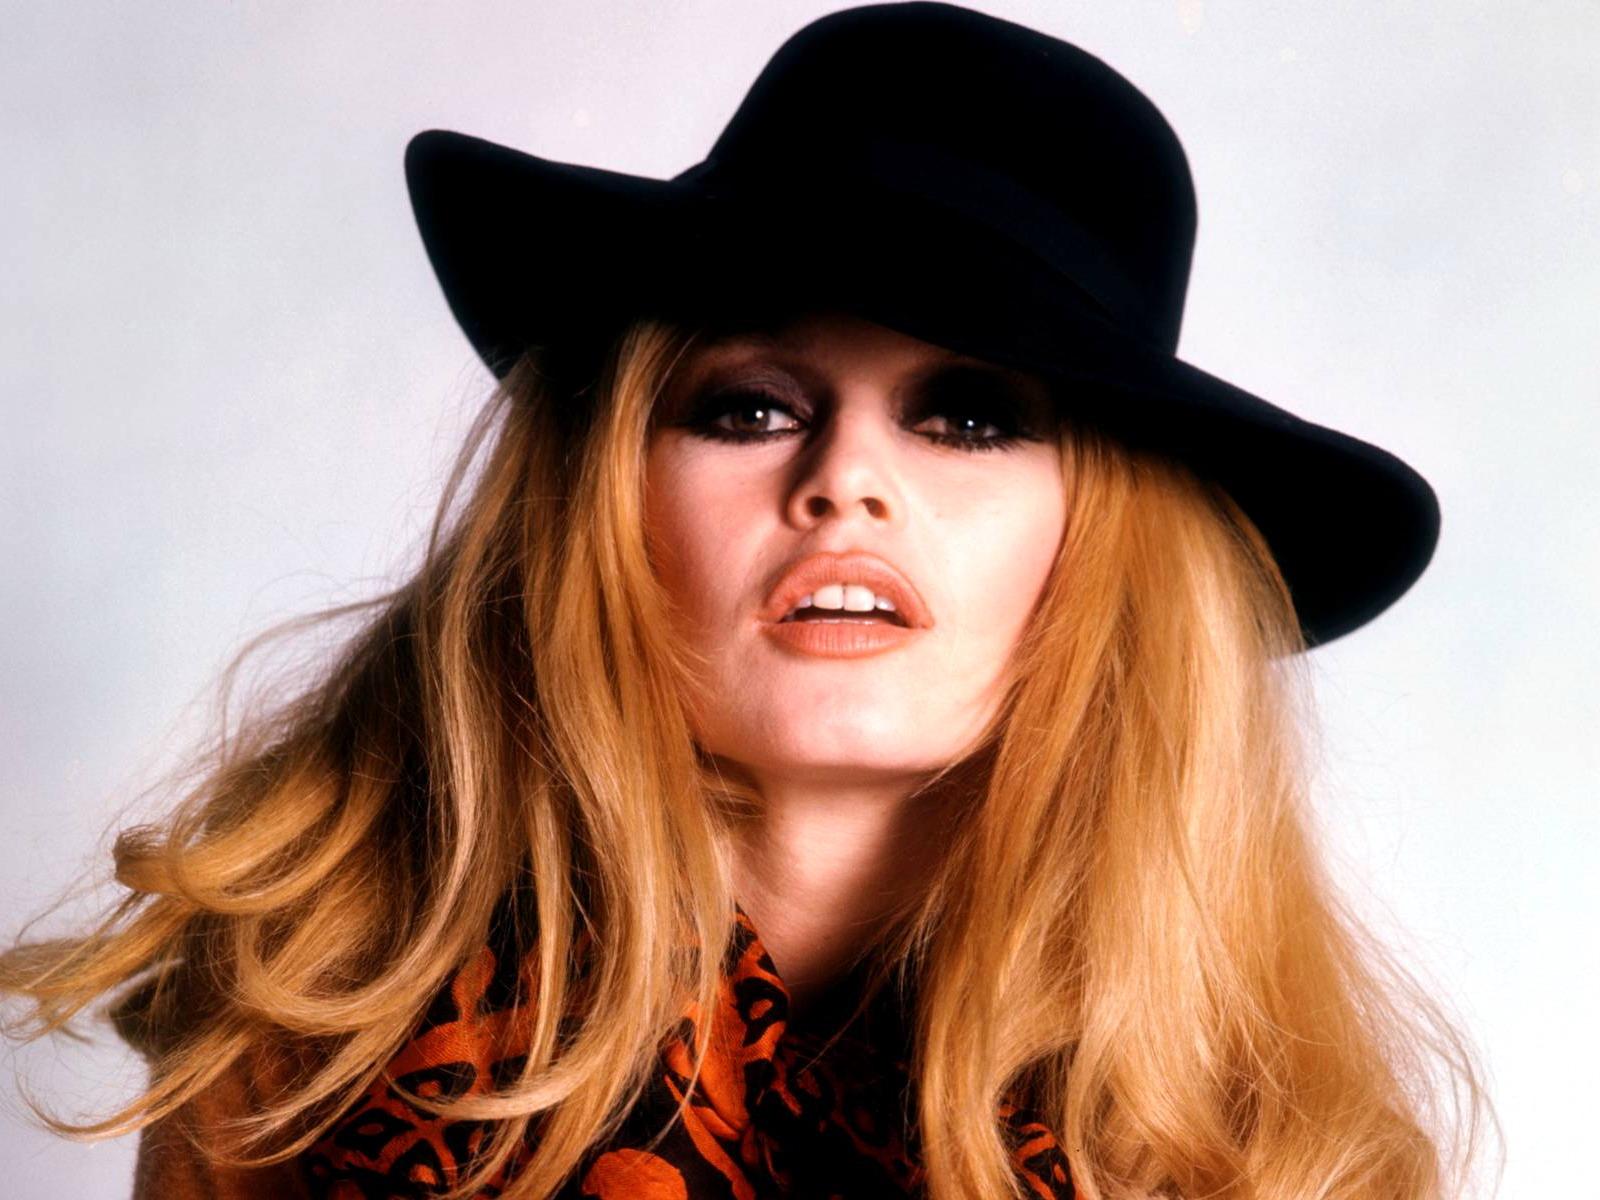 http://3.bp.blogspot.com/_-cr_FYVm3rI/S8O4pqG7YuI/AAAAAAAAEzw/zhInJ2B0gDU/s1600/kinopoisk.ru-Brigitte-Bardot-518488--w--1600.jpg